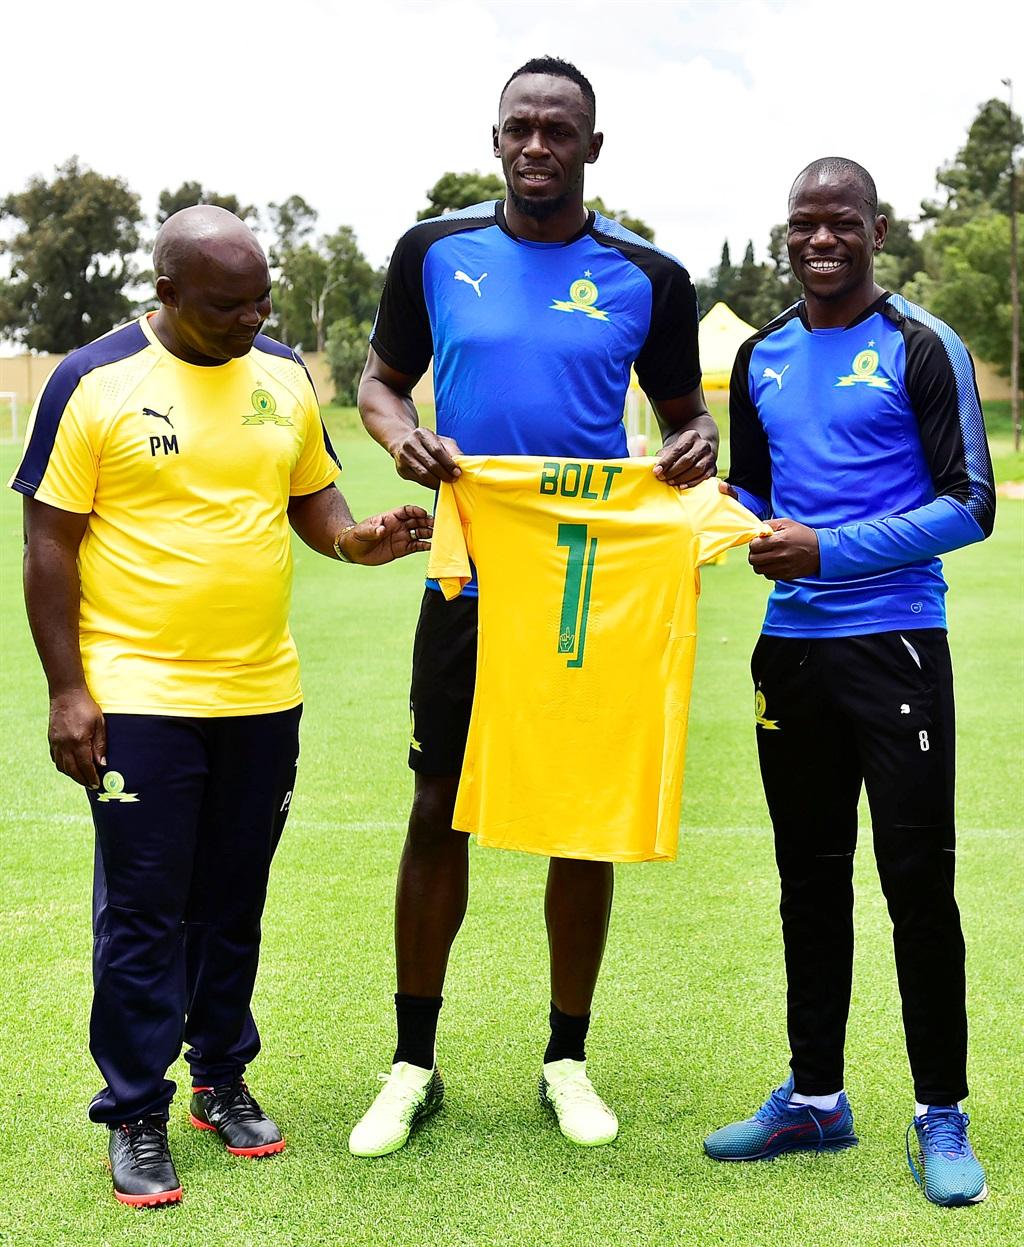 Mamelodi Sundowns coach Pitso Mosimane, Olympic sprint legend Usain Bolt and Sundowns captain Hlompho Kekana Picture: Themba Makofane